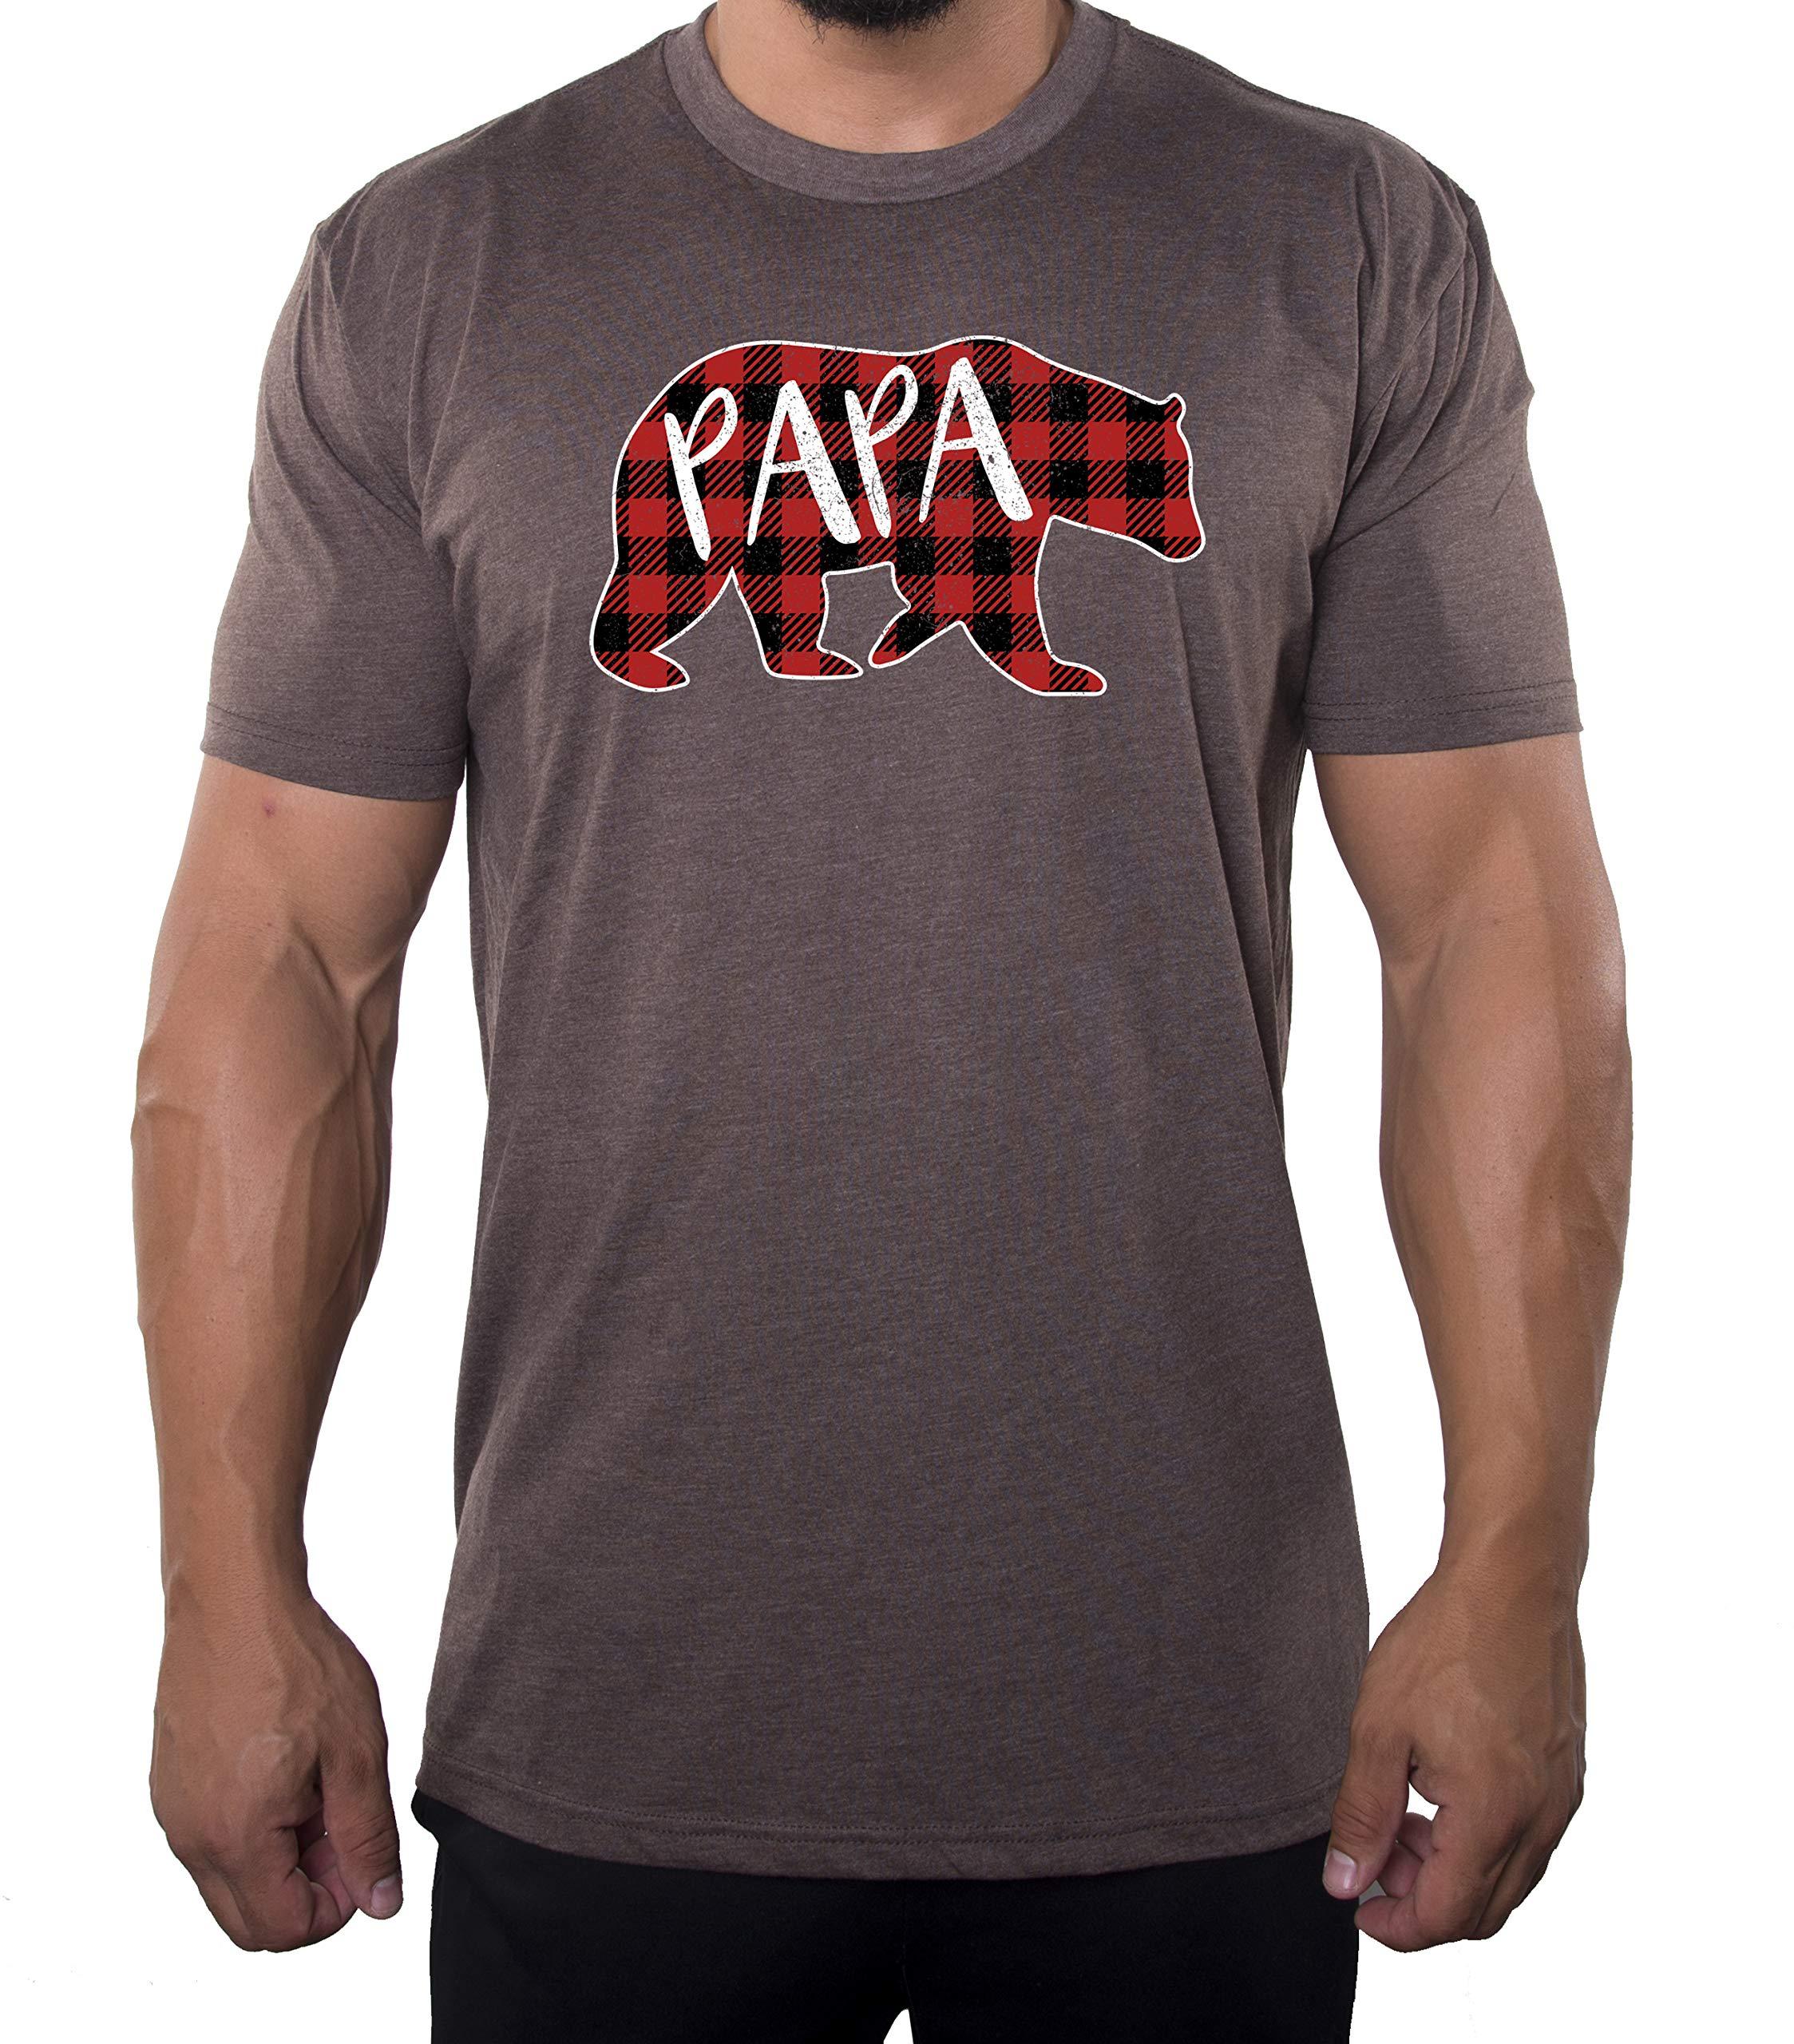 Papa Bear Shirt With Buffalo Plaid Shirts Cool Shirts For Dad 3439